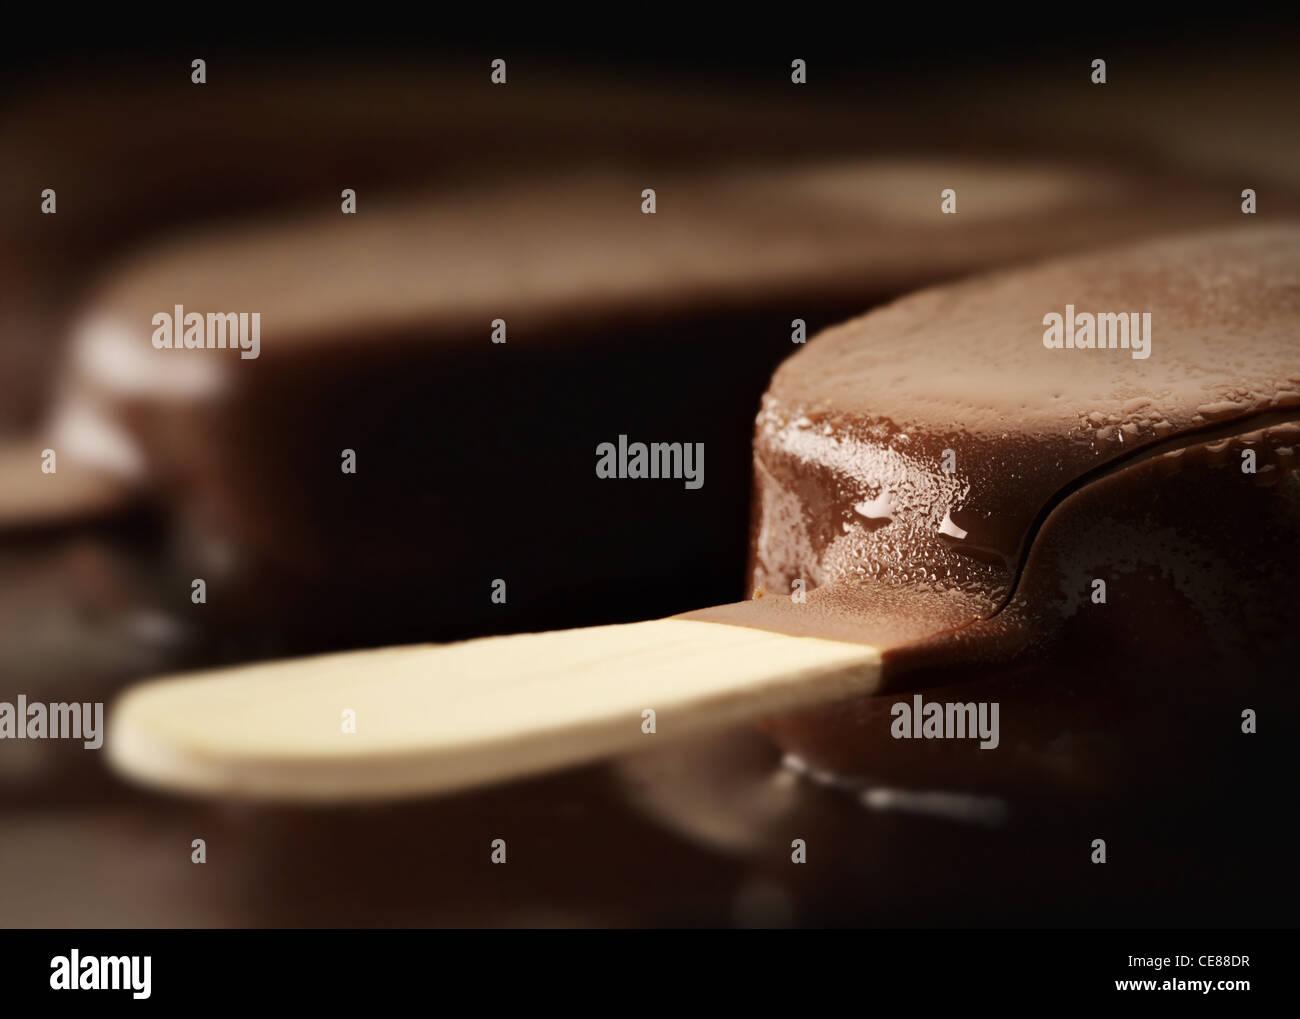 Melting Ice Cream Chocolate Bar Nahaufnahme Stockbild